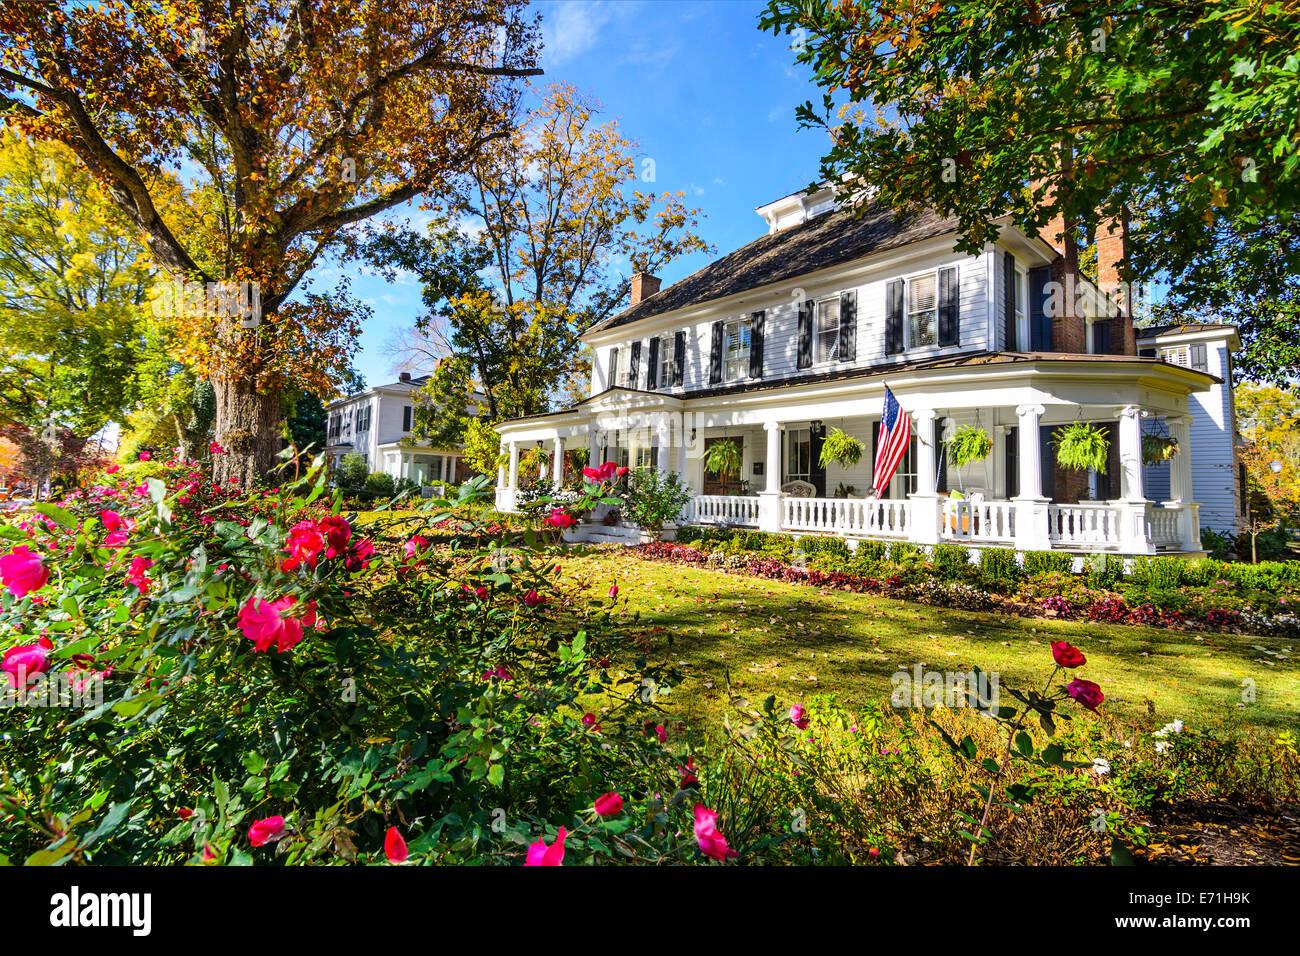 Madison, Georgia, USA at the antebellum homes district. - Stock Image